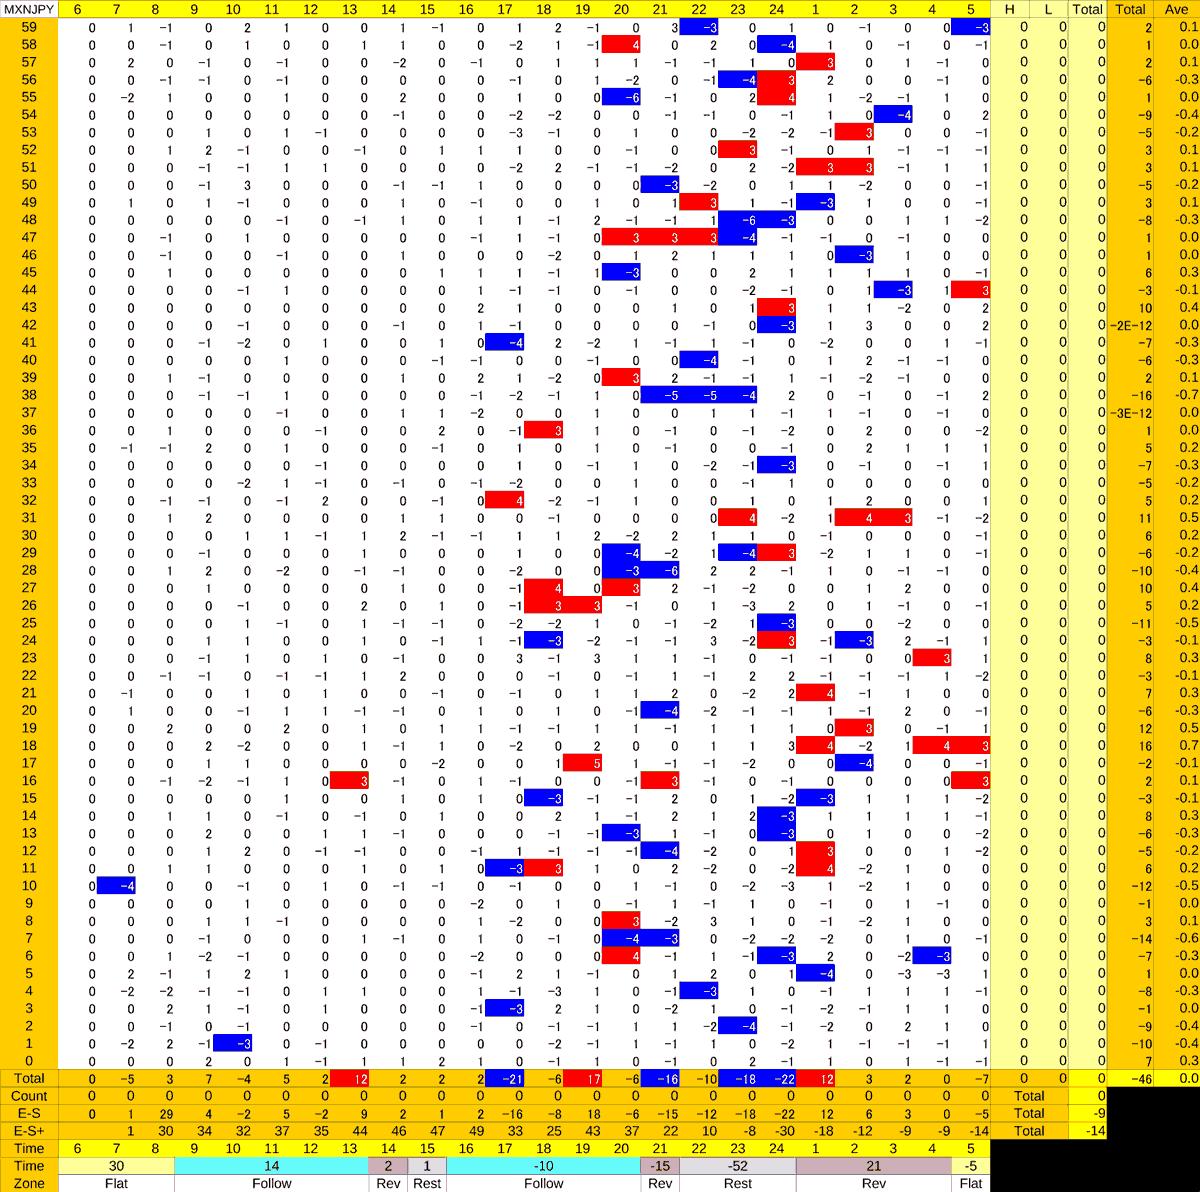 20210125_HS(3)MXNJPY